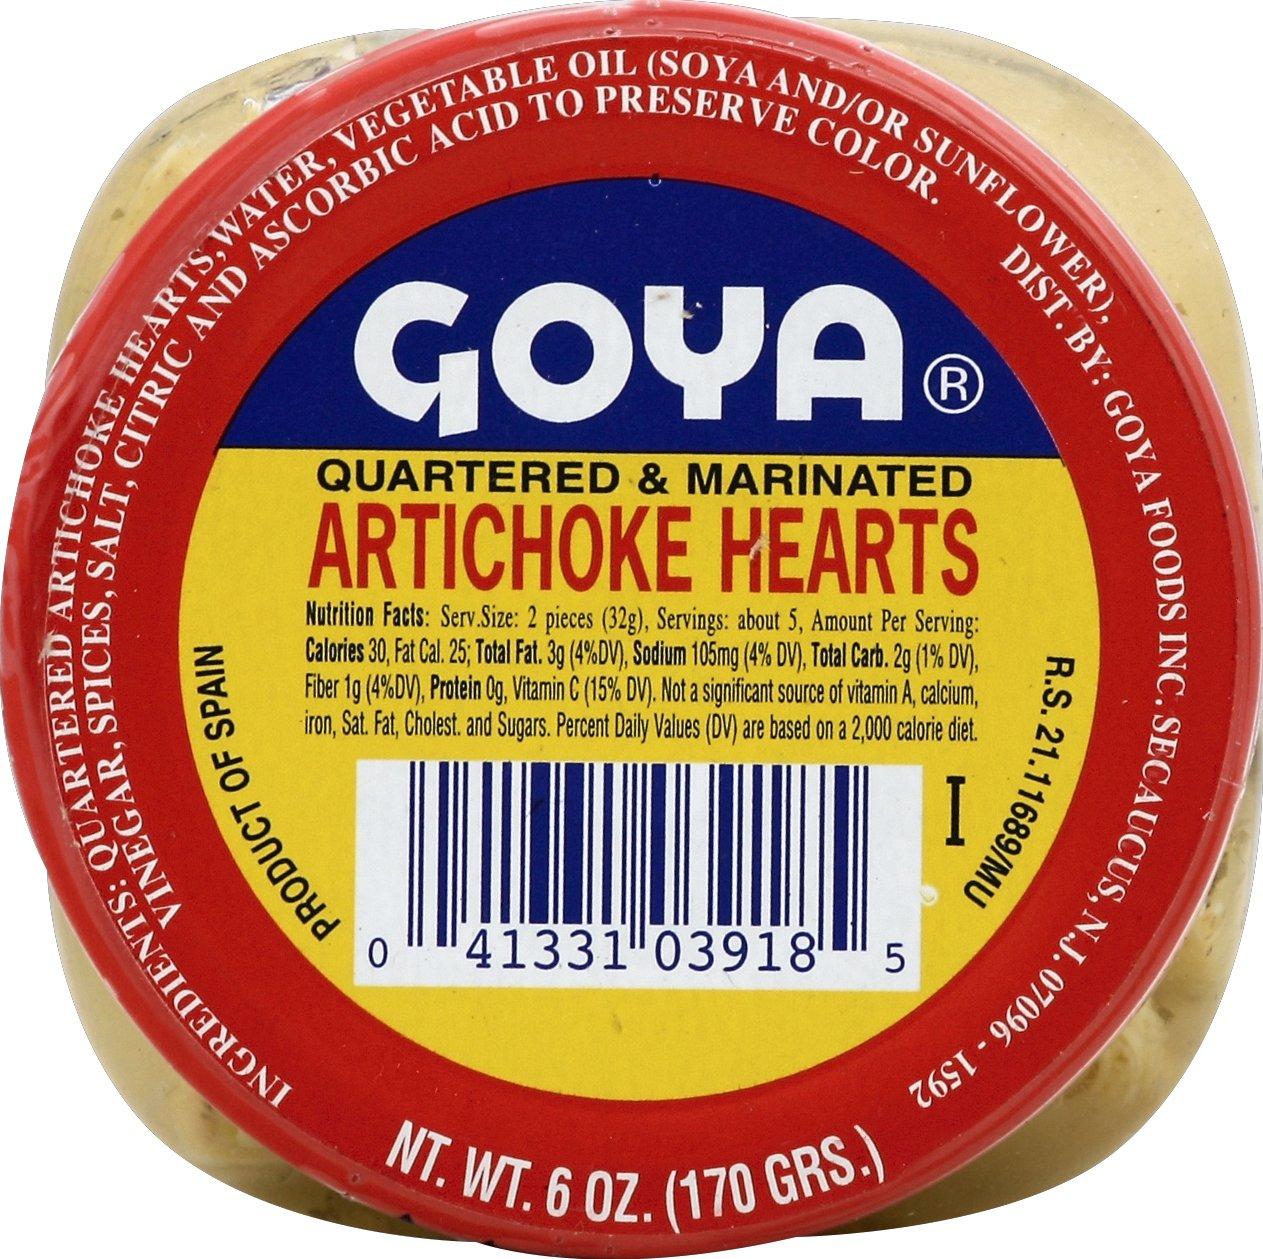 Goya Artichoke Marin Olive Oil, 6-Ounce Units (Pack of 12)